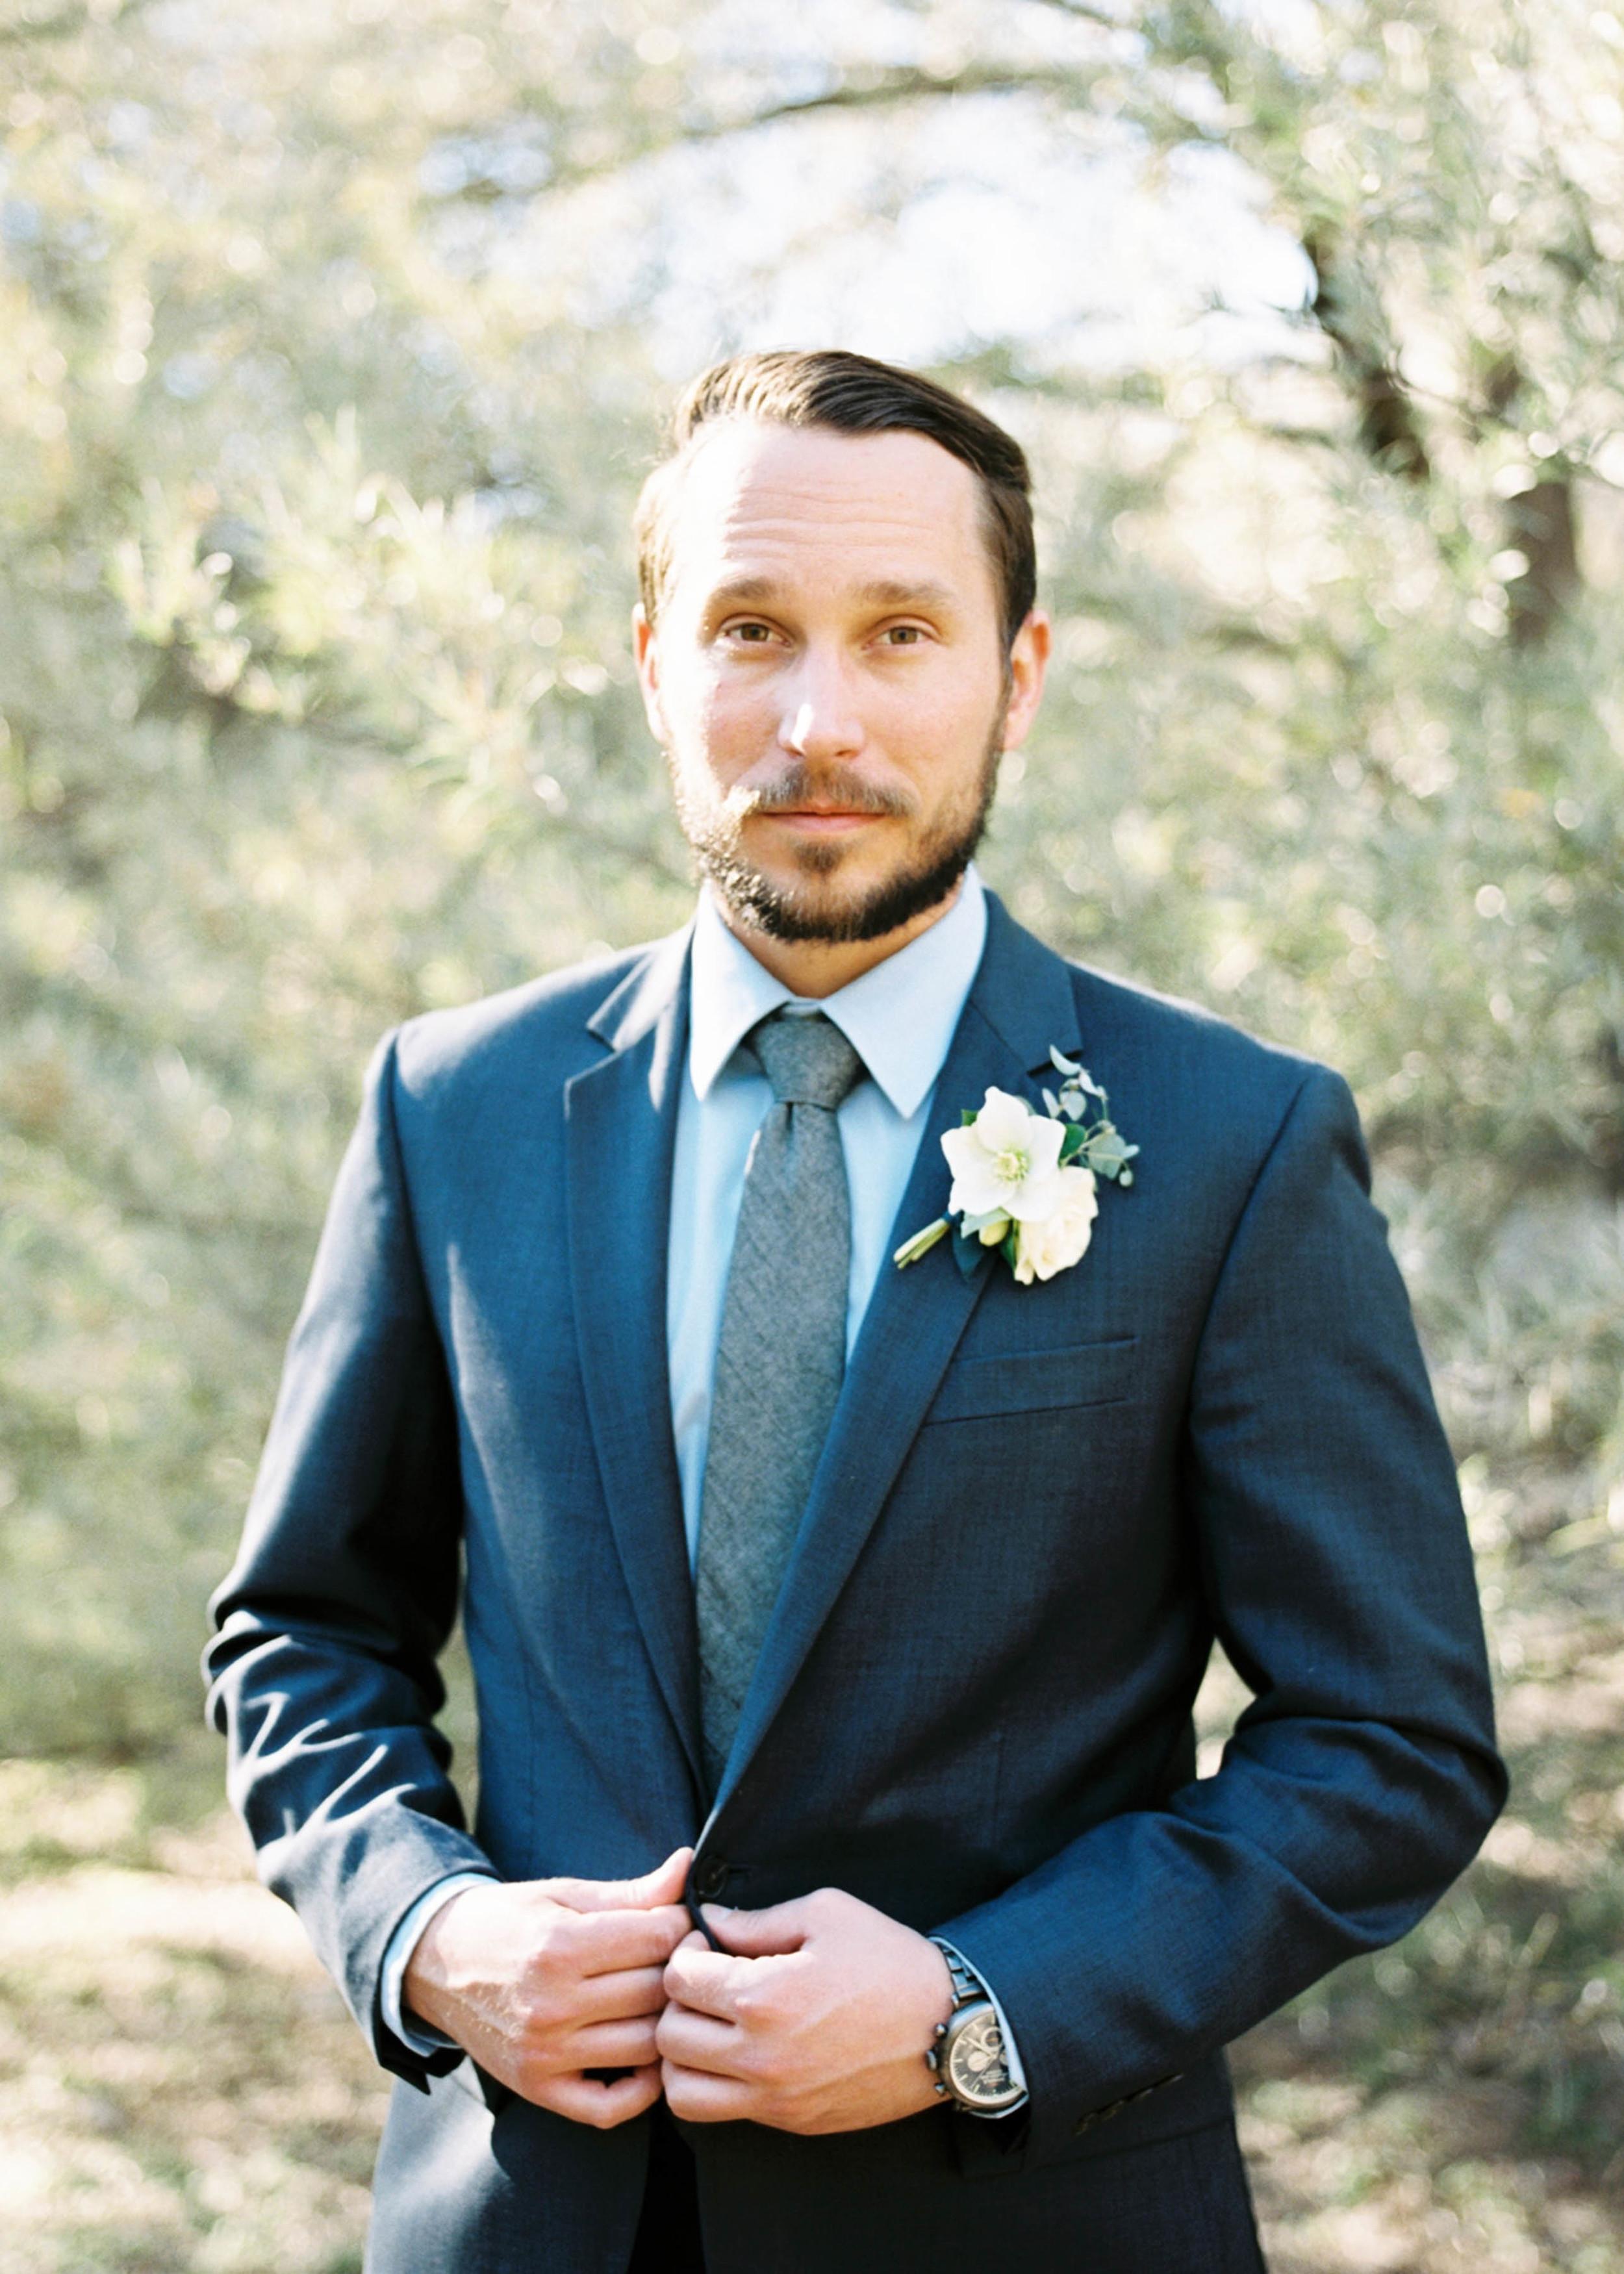 Danford-Photography-Bozeman-Montana-Arizona-Fine Art Film-Wedding-Engagement-Photographers-19.jpg